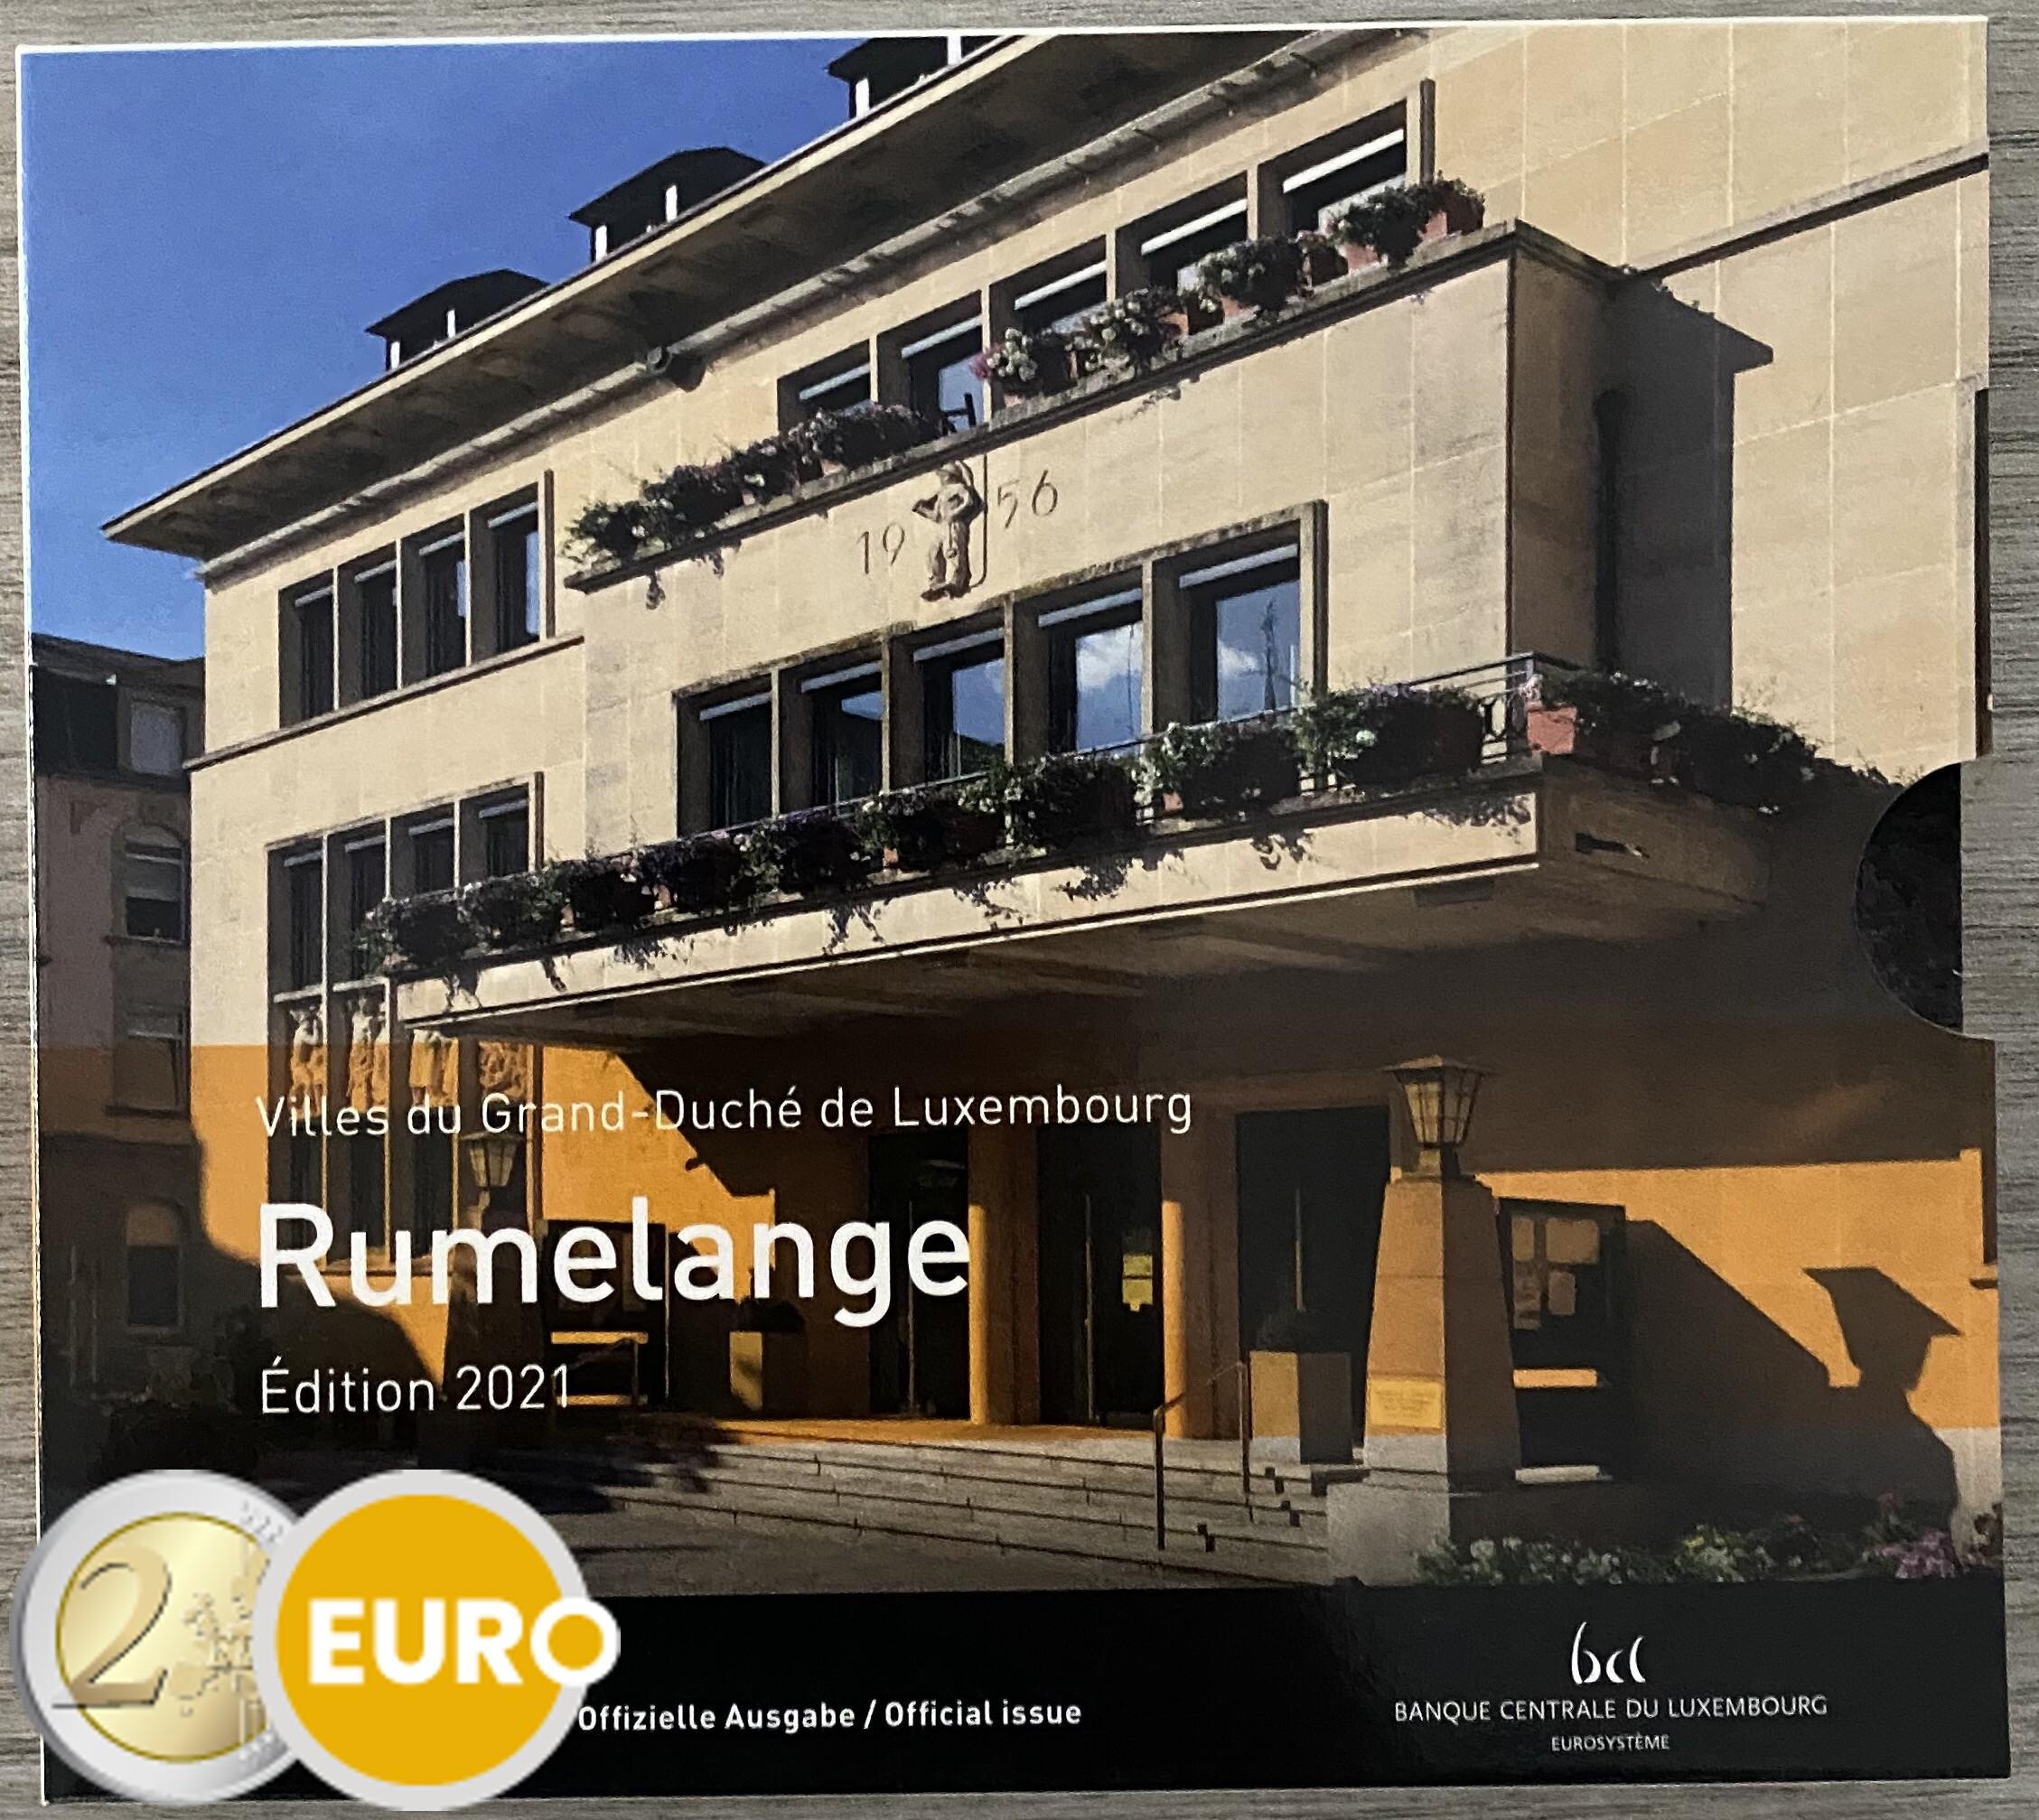 Serie de euro BU FDC Luxemburgo 2021 Rumelange + 2 euros bodas Enrique foto